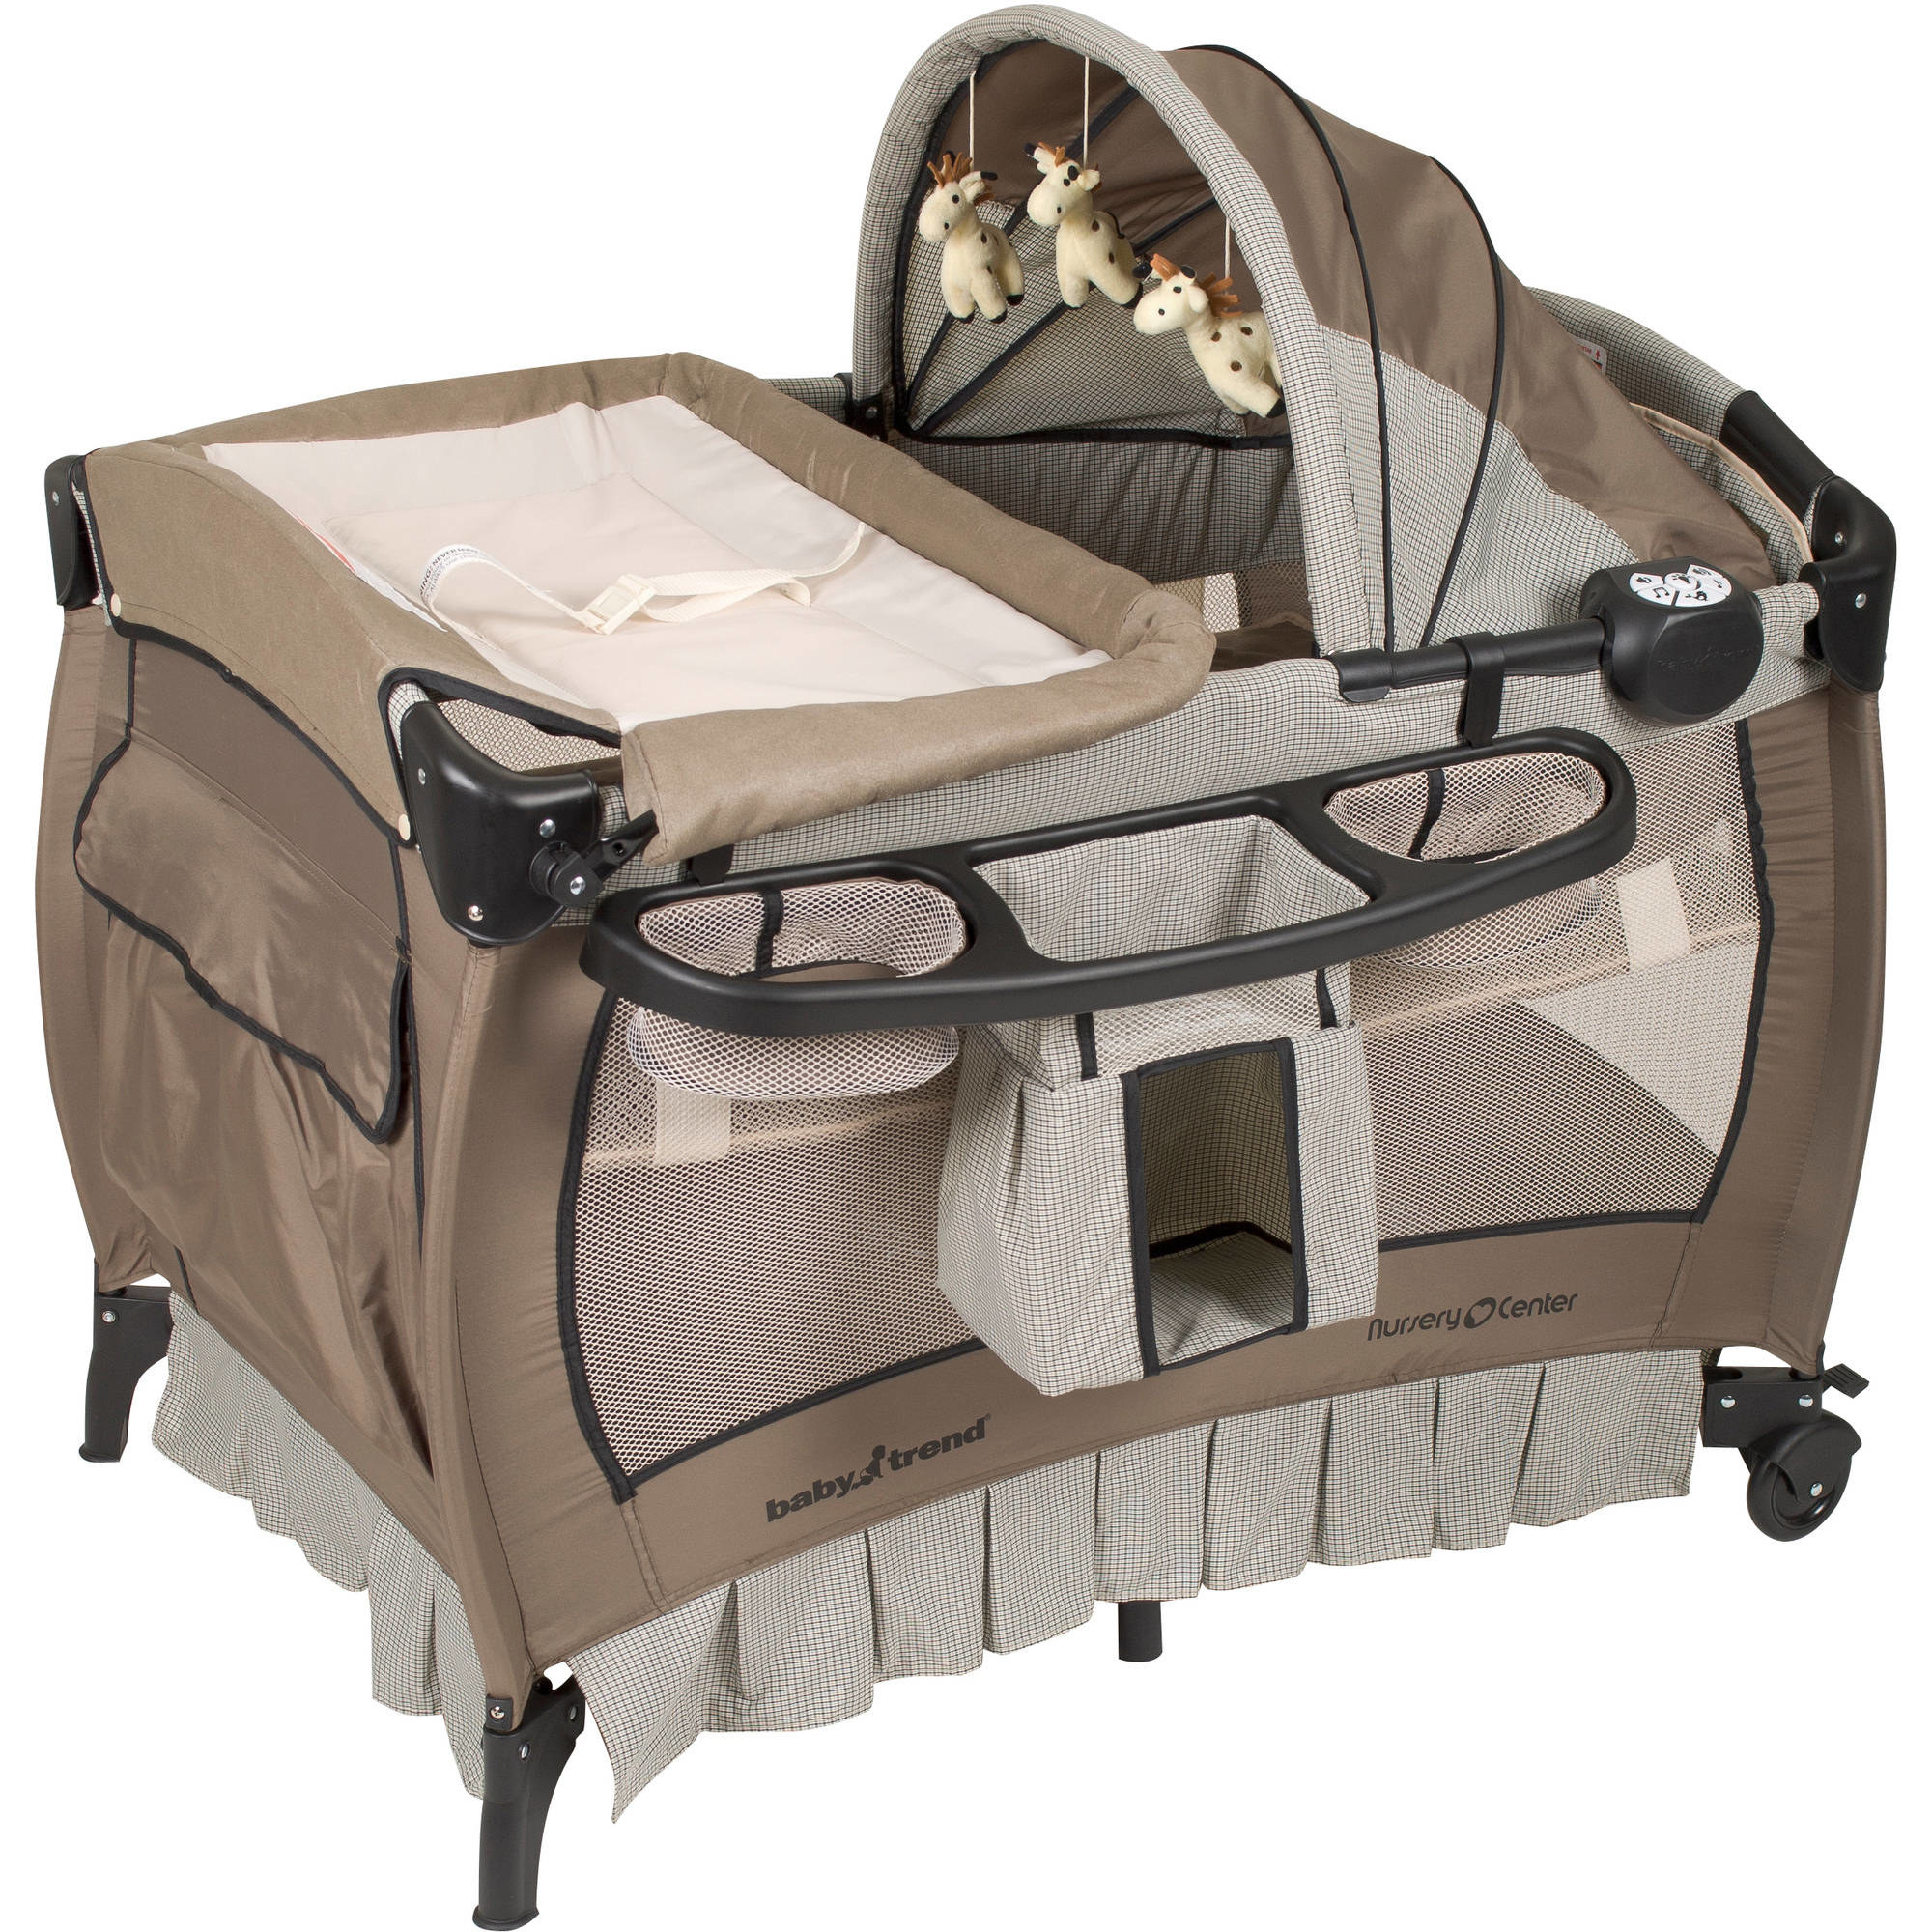 baby trend nursery center multi-function playard